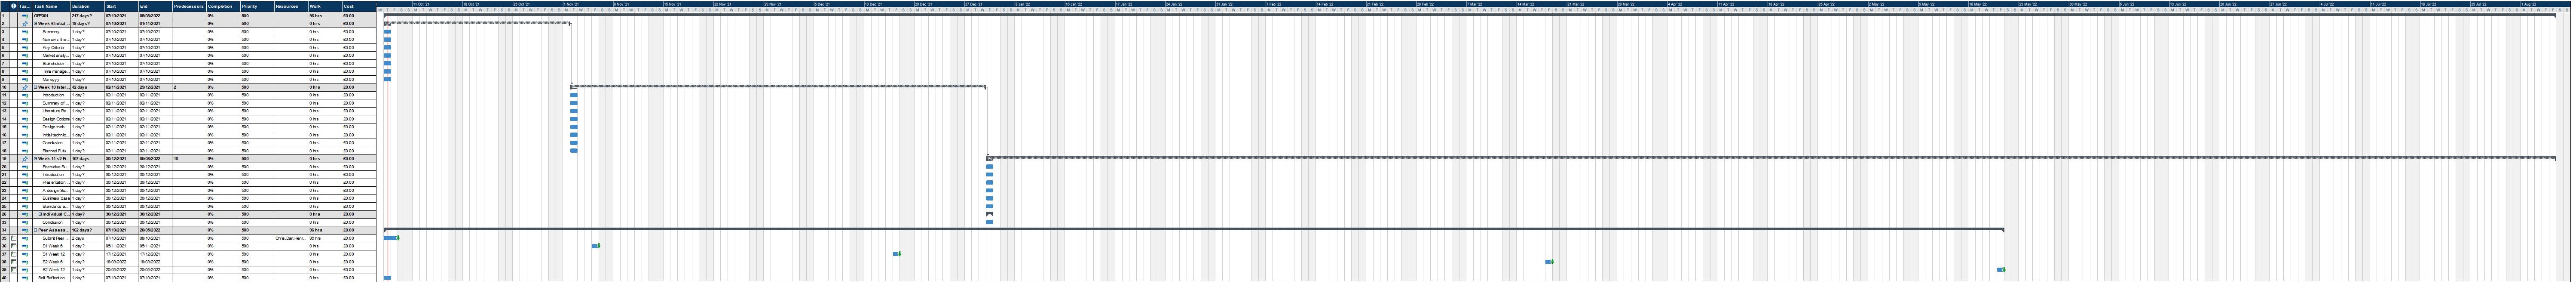 GEE301 Gnatt Chart Timeline